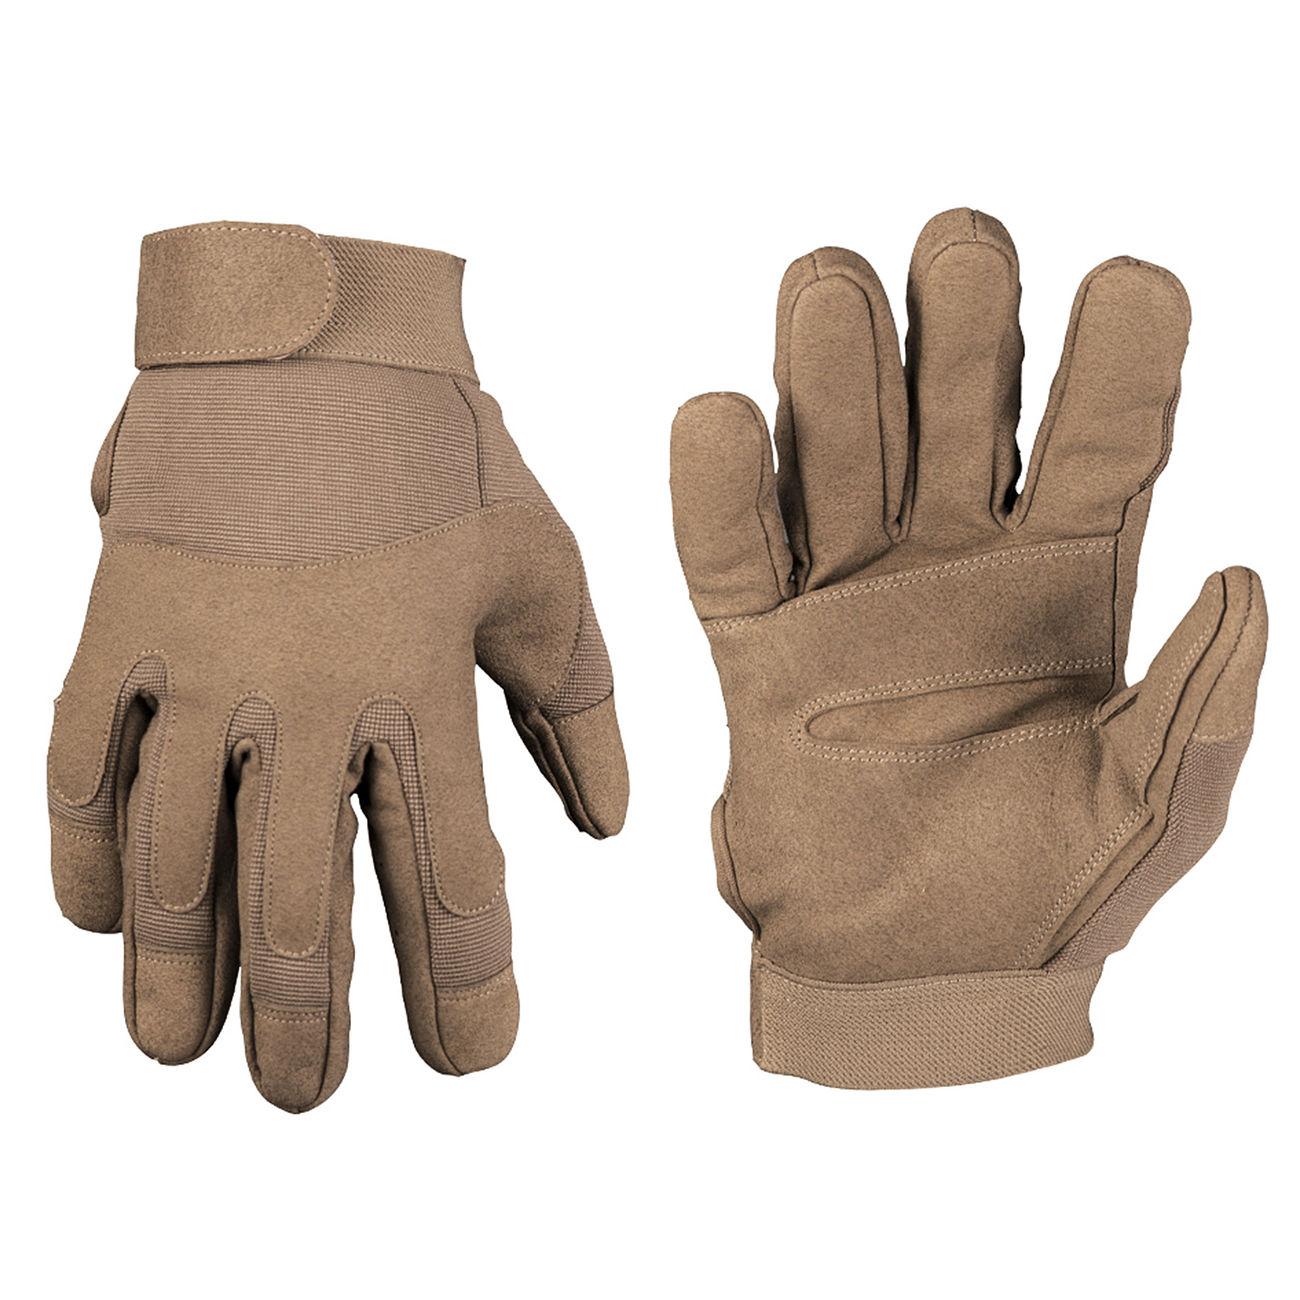 a8aa8793b948e Mil-Tec Army Handschuhe dark coyote günstig kaufen - Kotte   Zeller